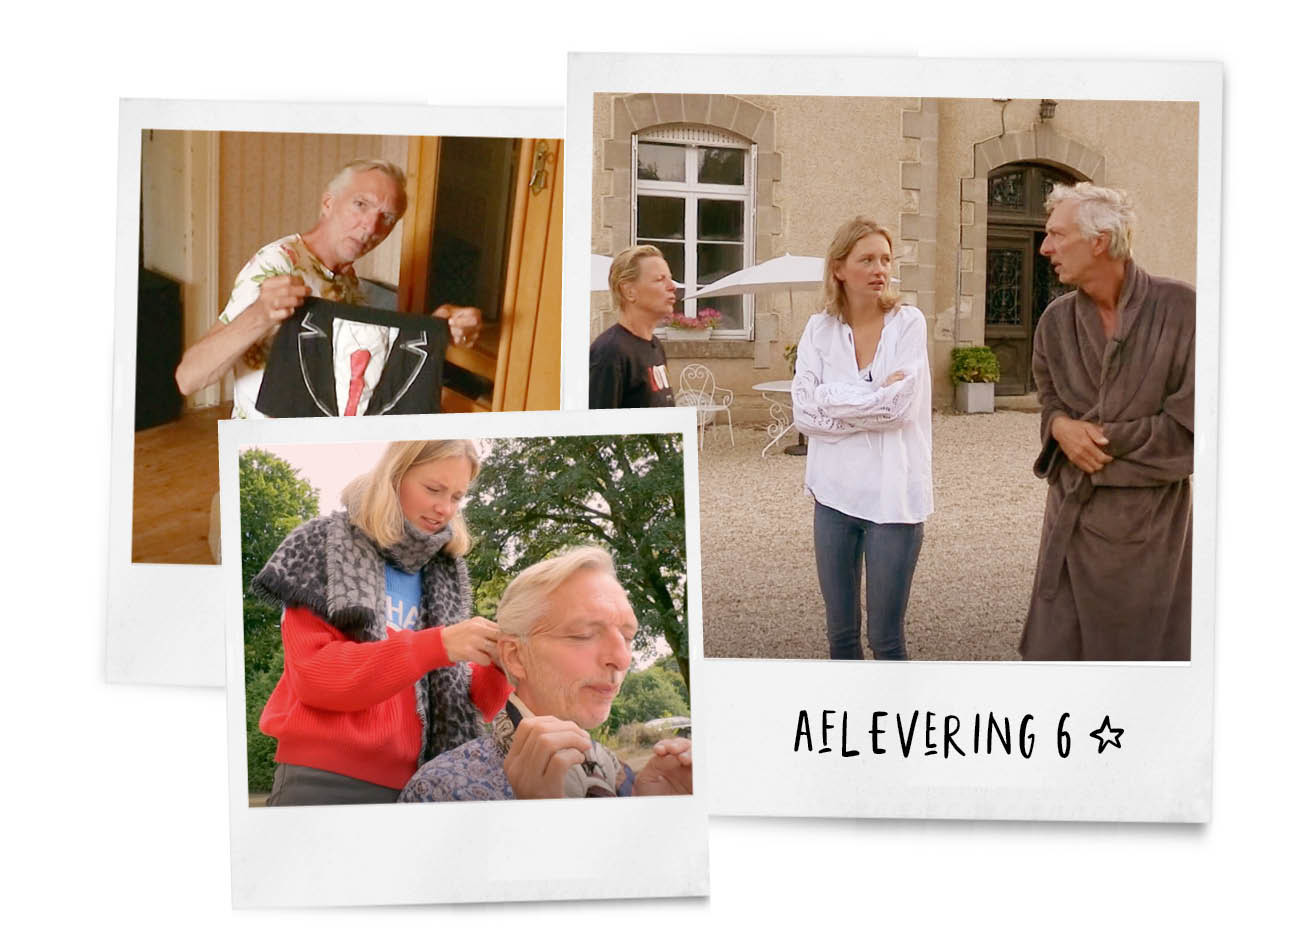 chateau meiland aflevering 6 familie meiland buiten op straat facelift